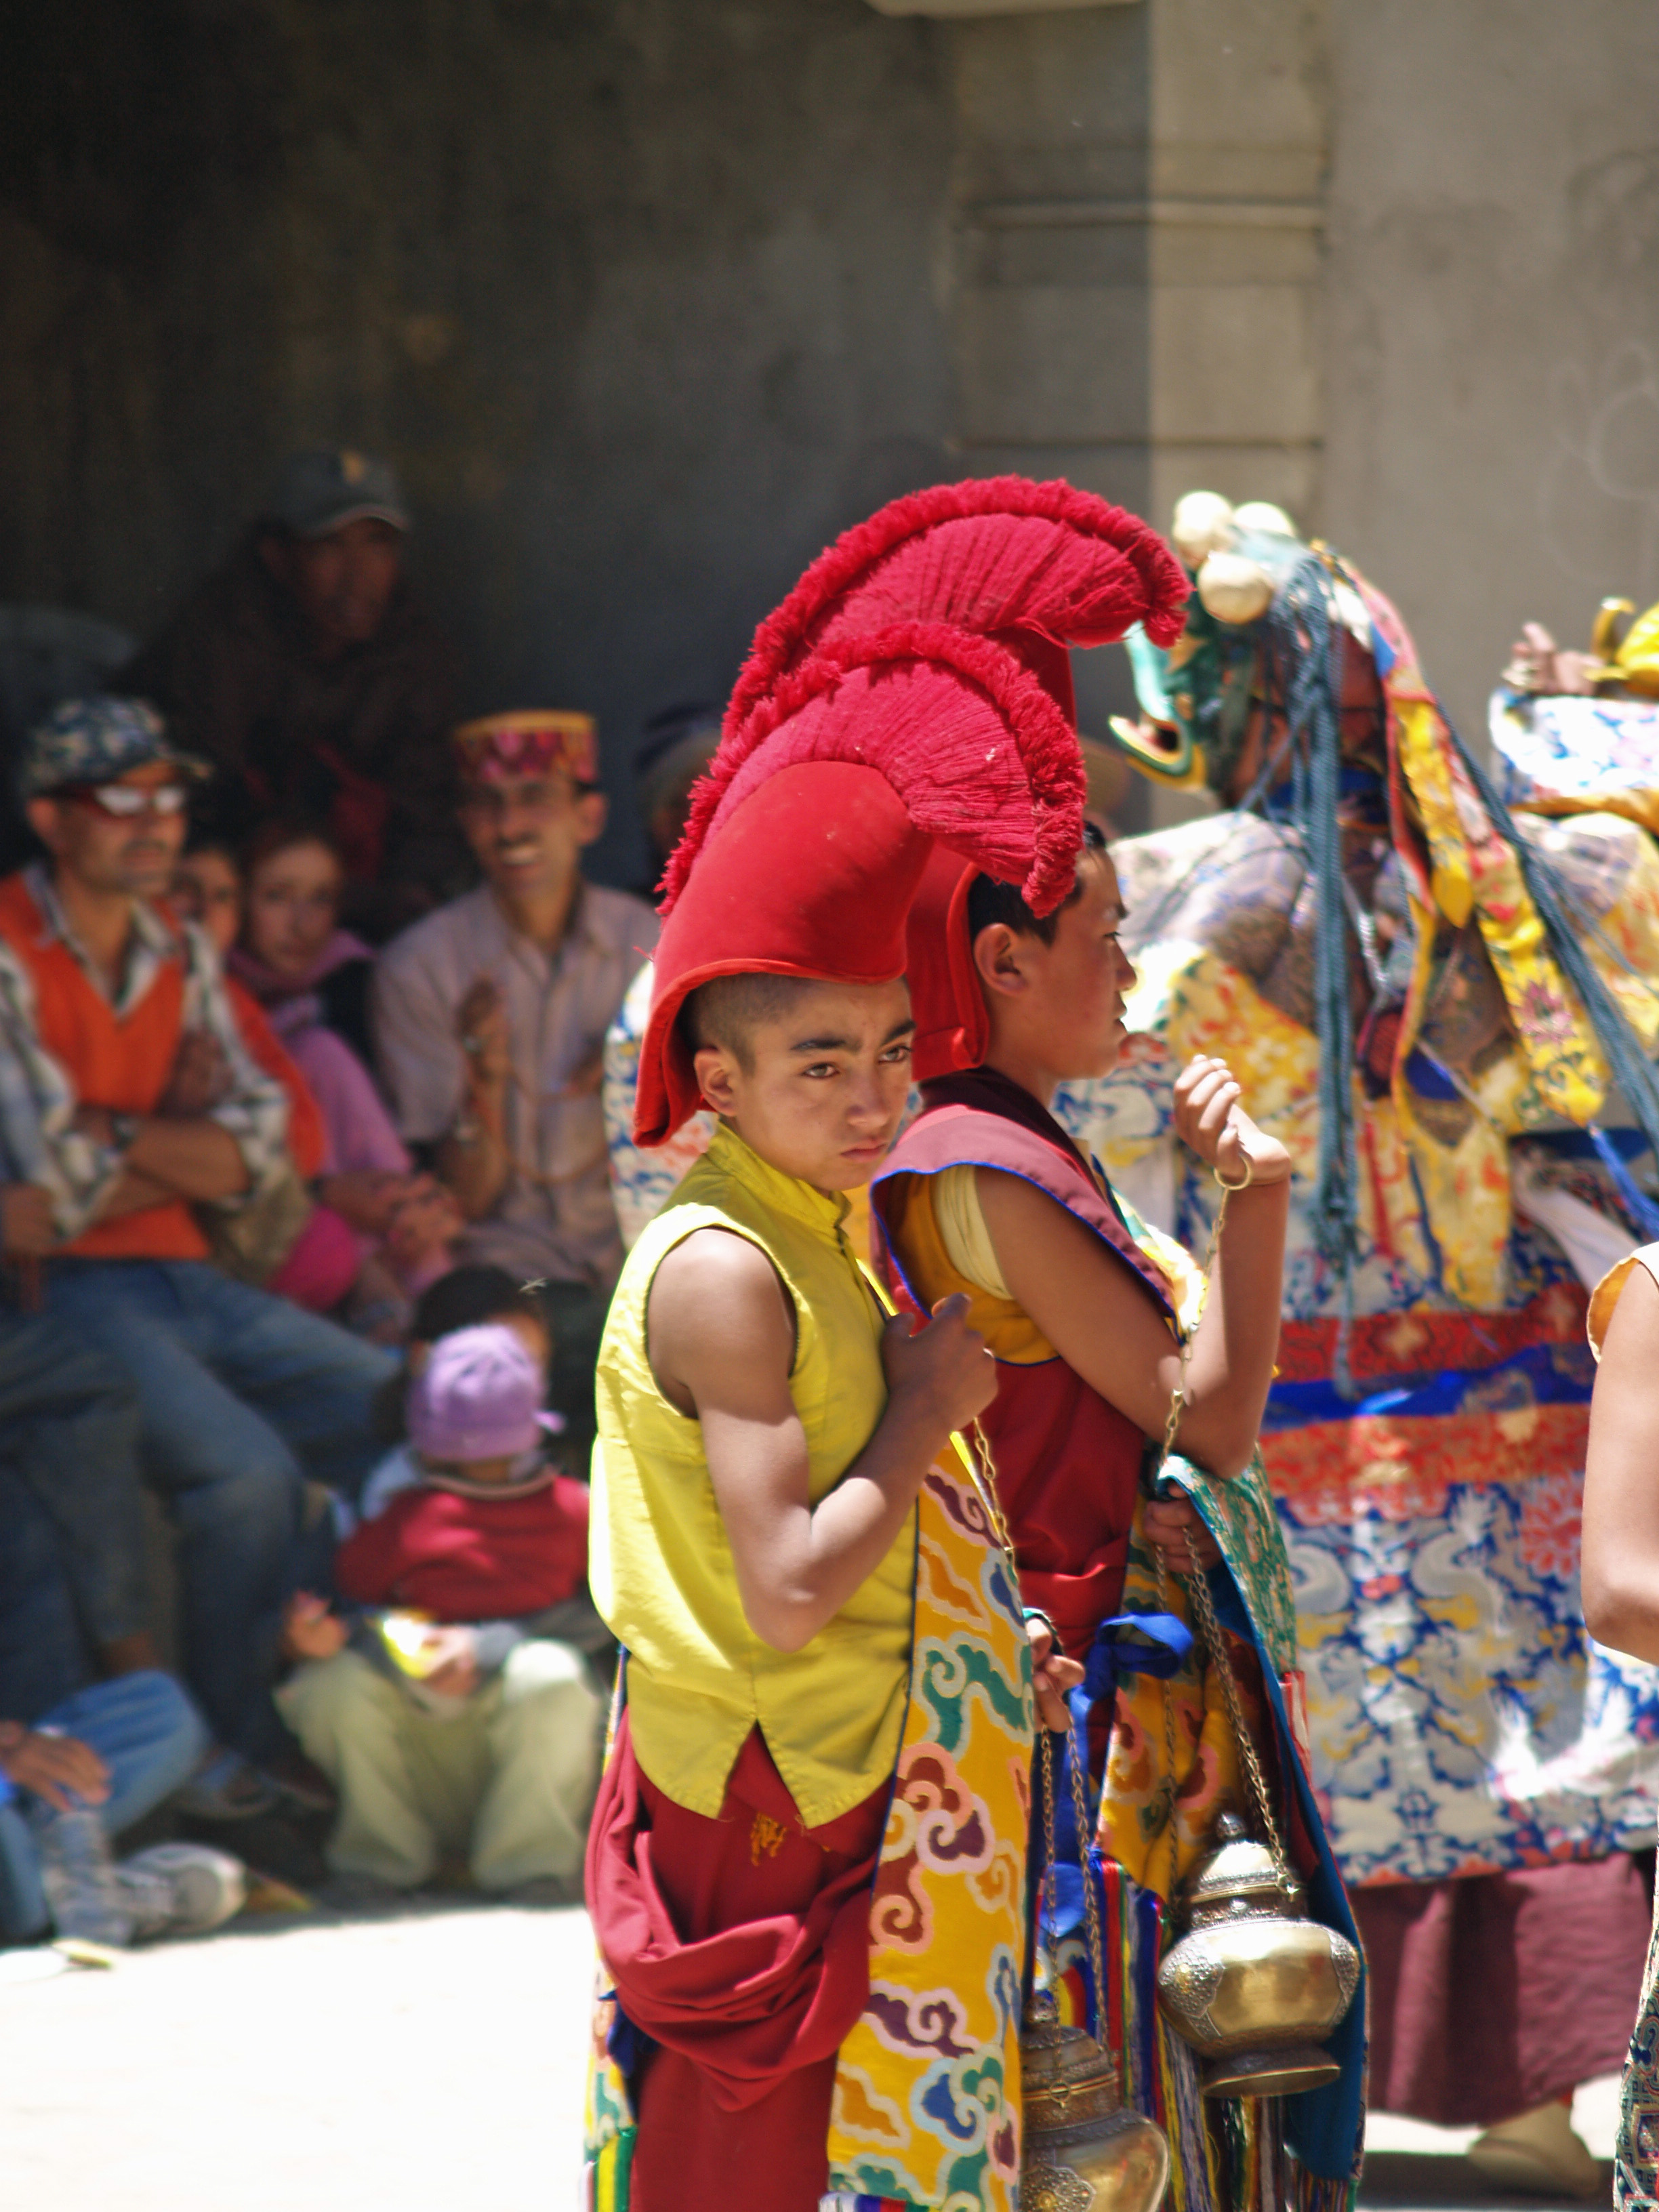 Fichier Young buddhist monk in ceremonial headwear.jpg — Wikipédia 87981dd2fec